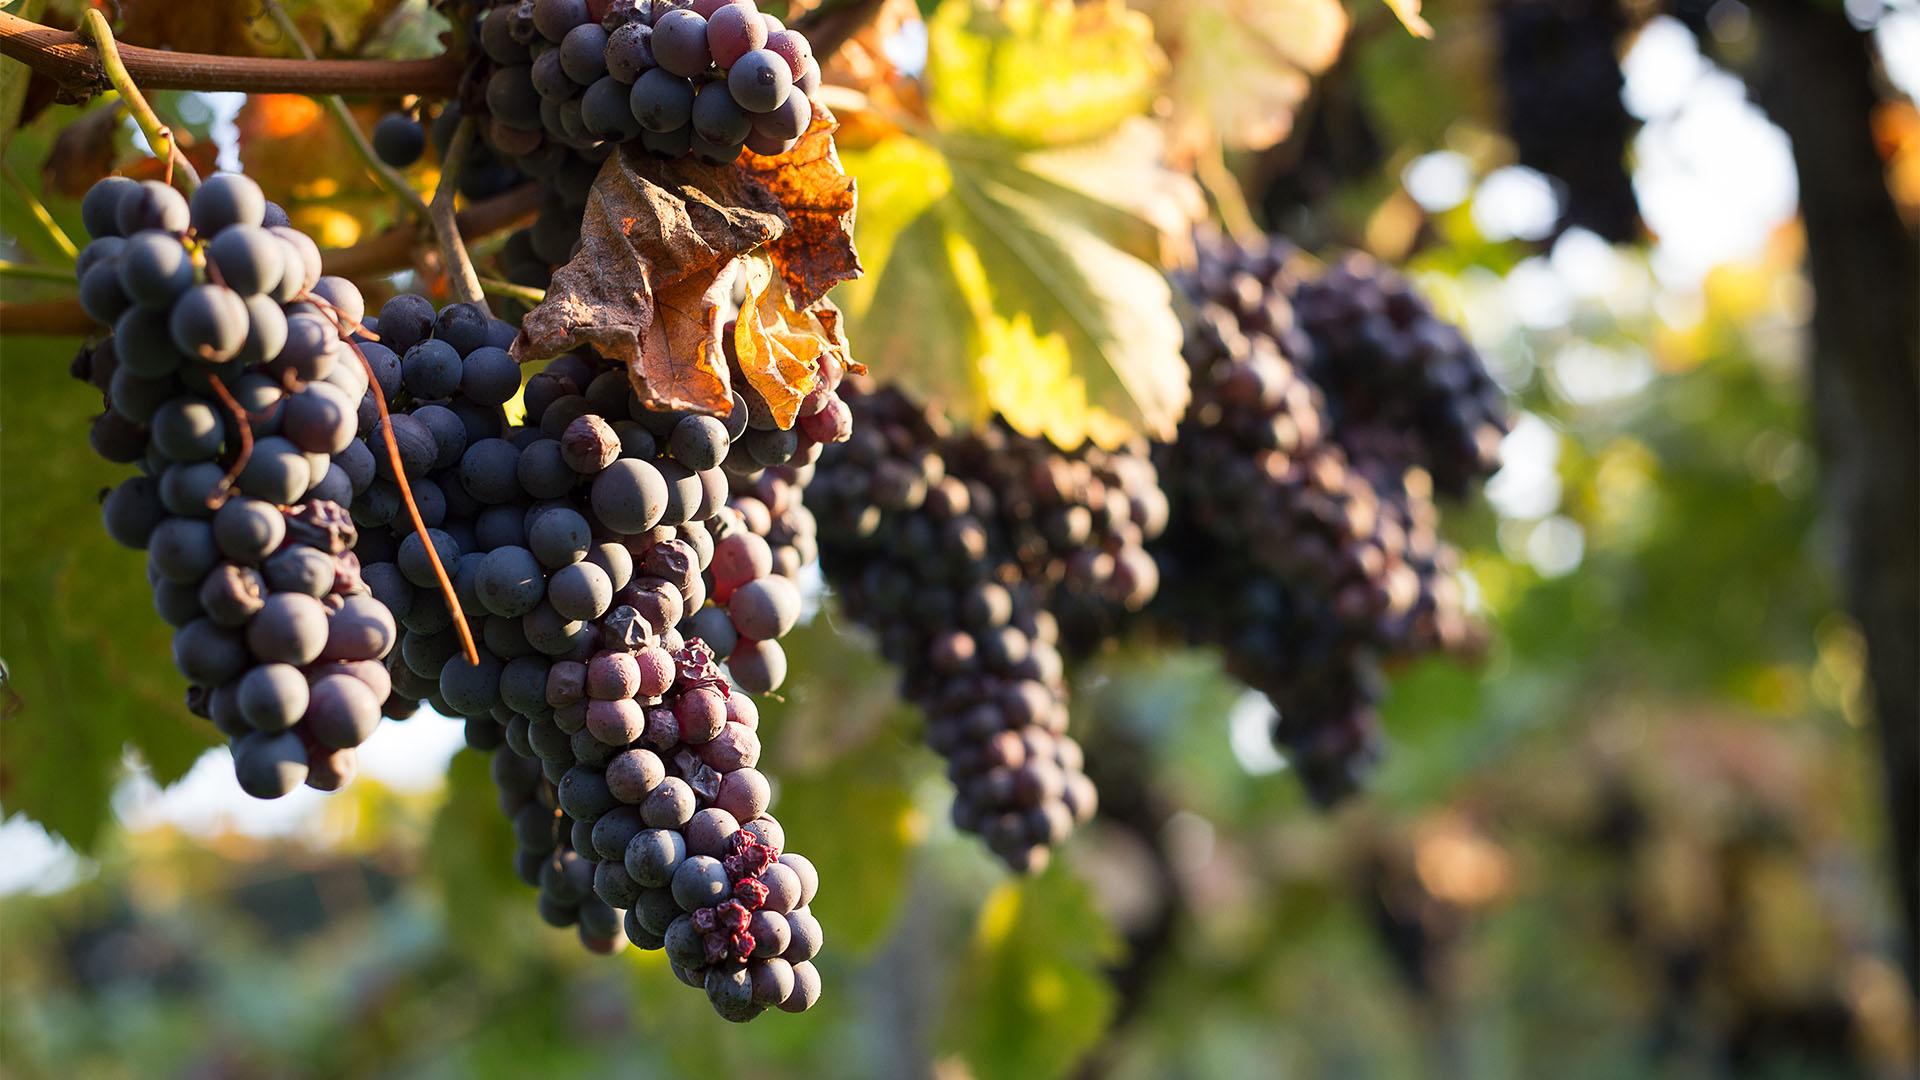 Maria Ernesta Berucci | Azienda agricola, vitivinicola e agrituristica